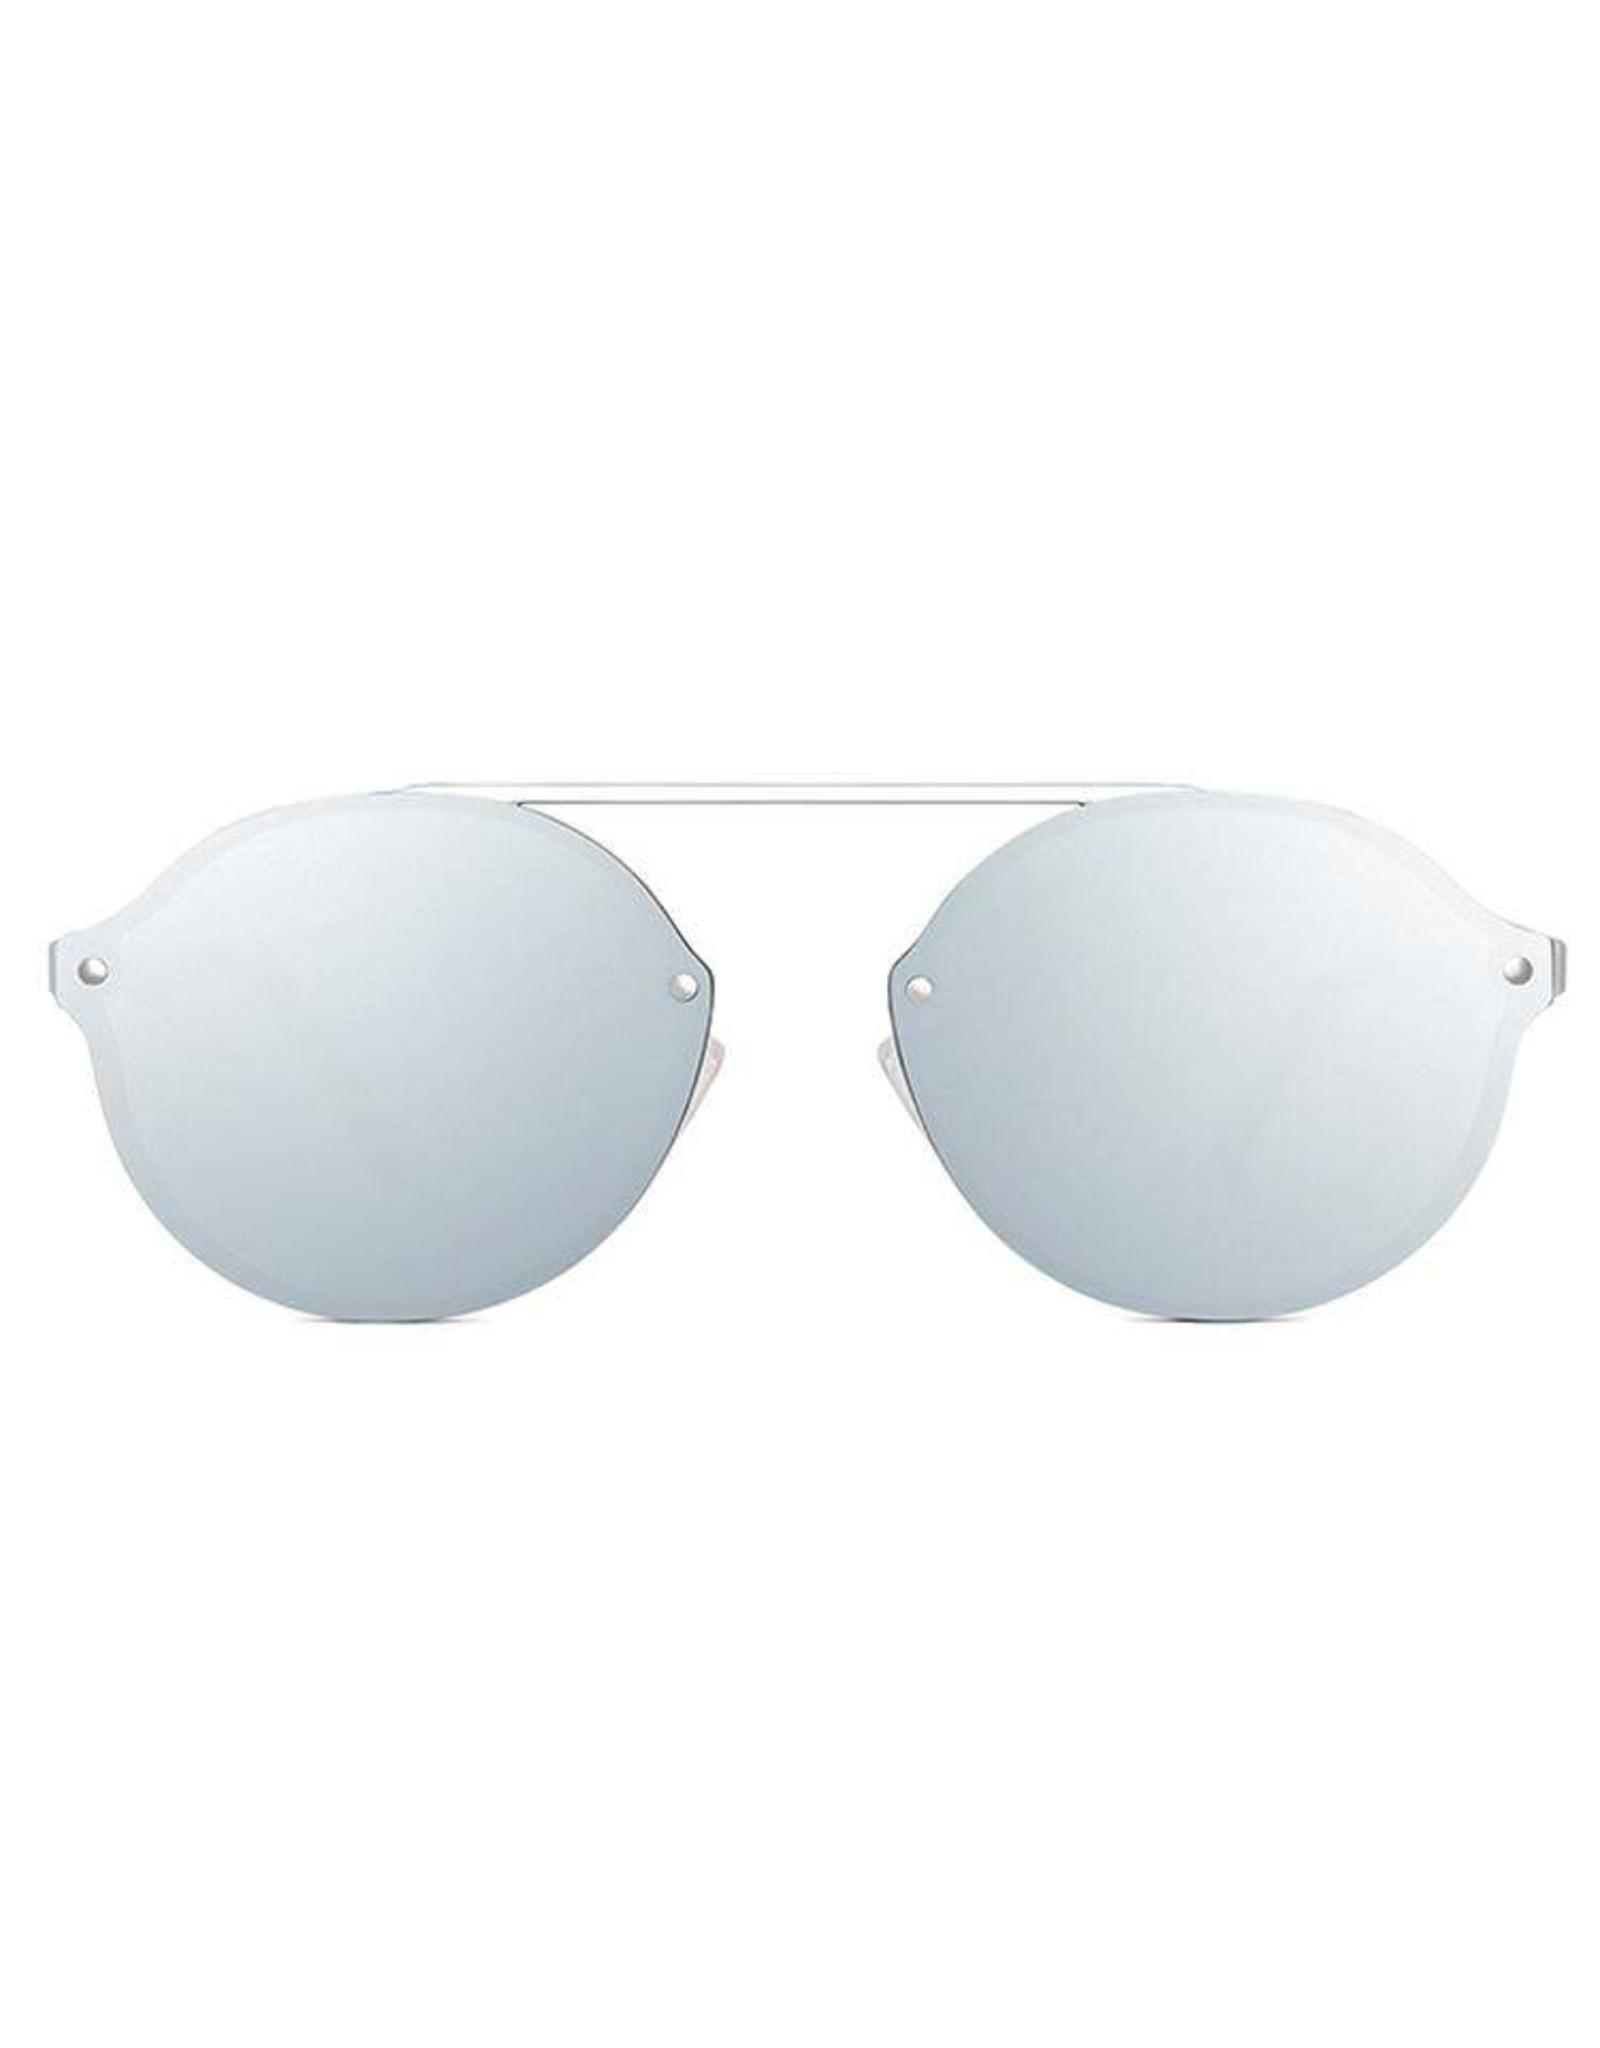 Maltessa Eyewear Verona